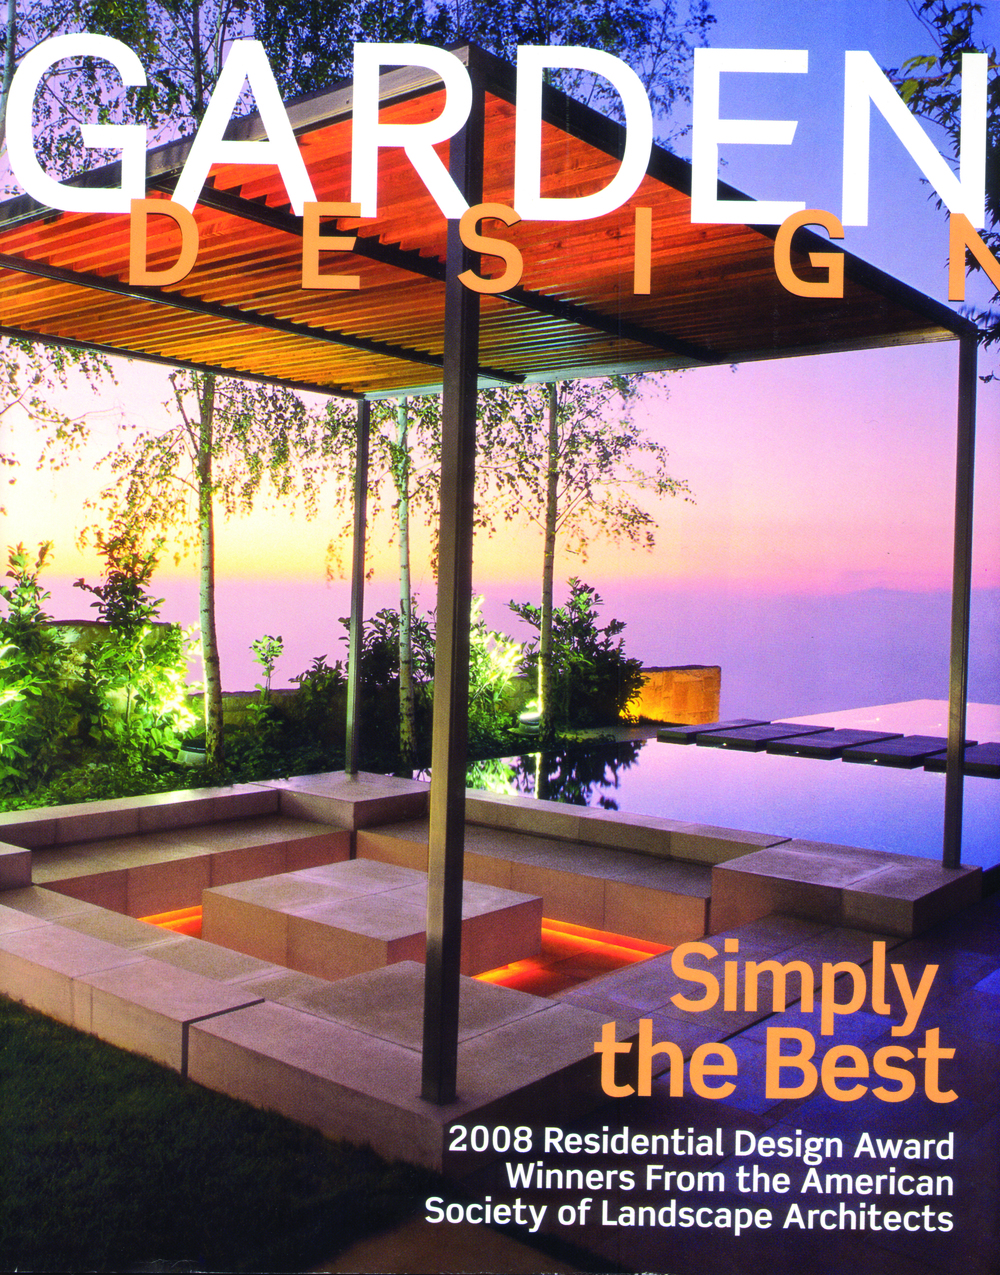 Garden Design cover - NovDec 2008.jpg